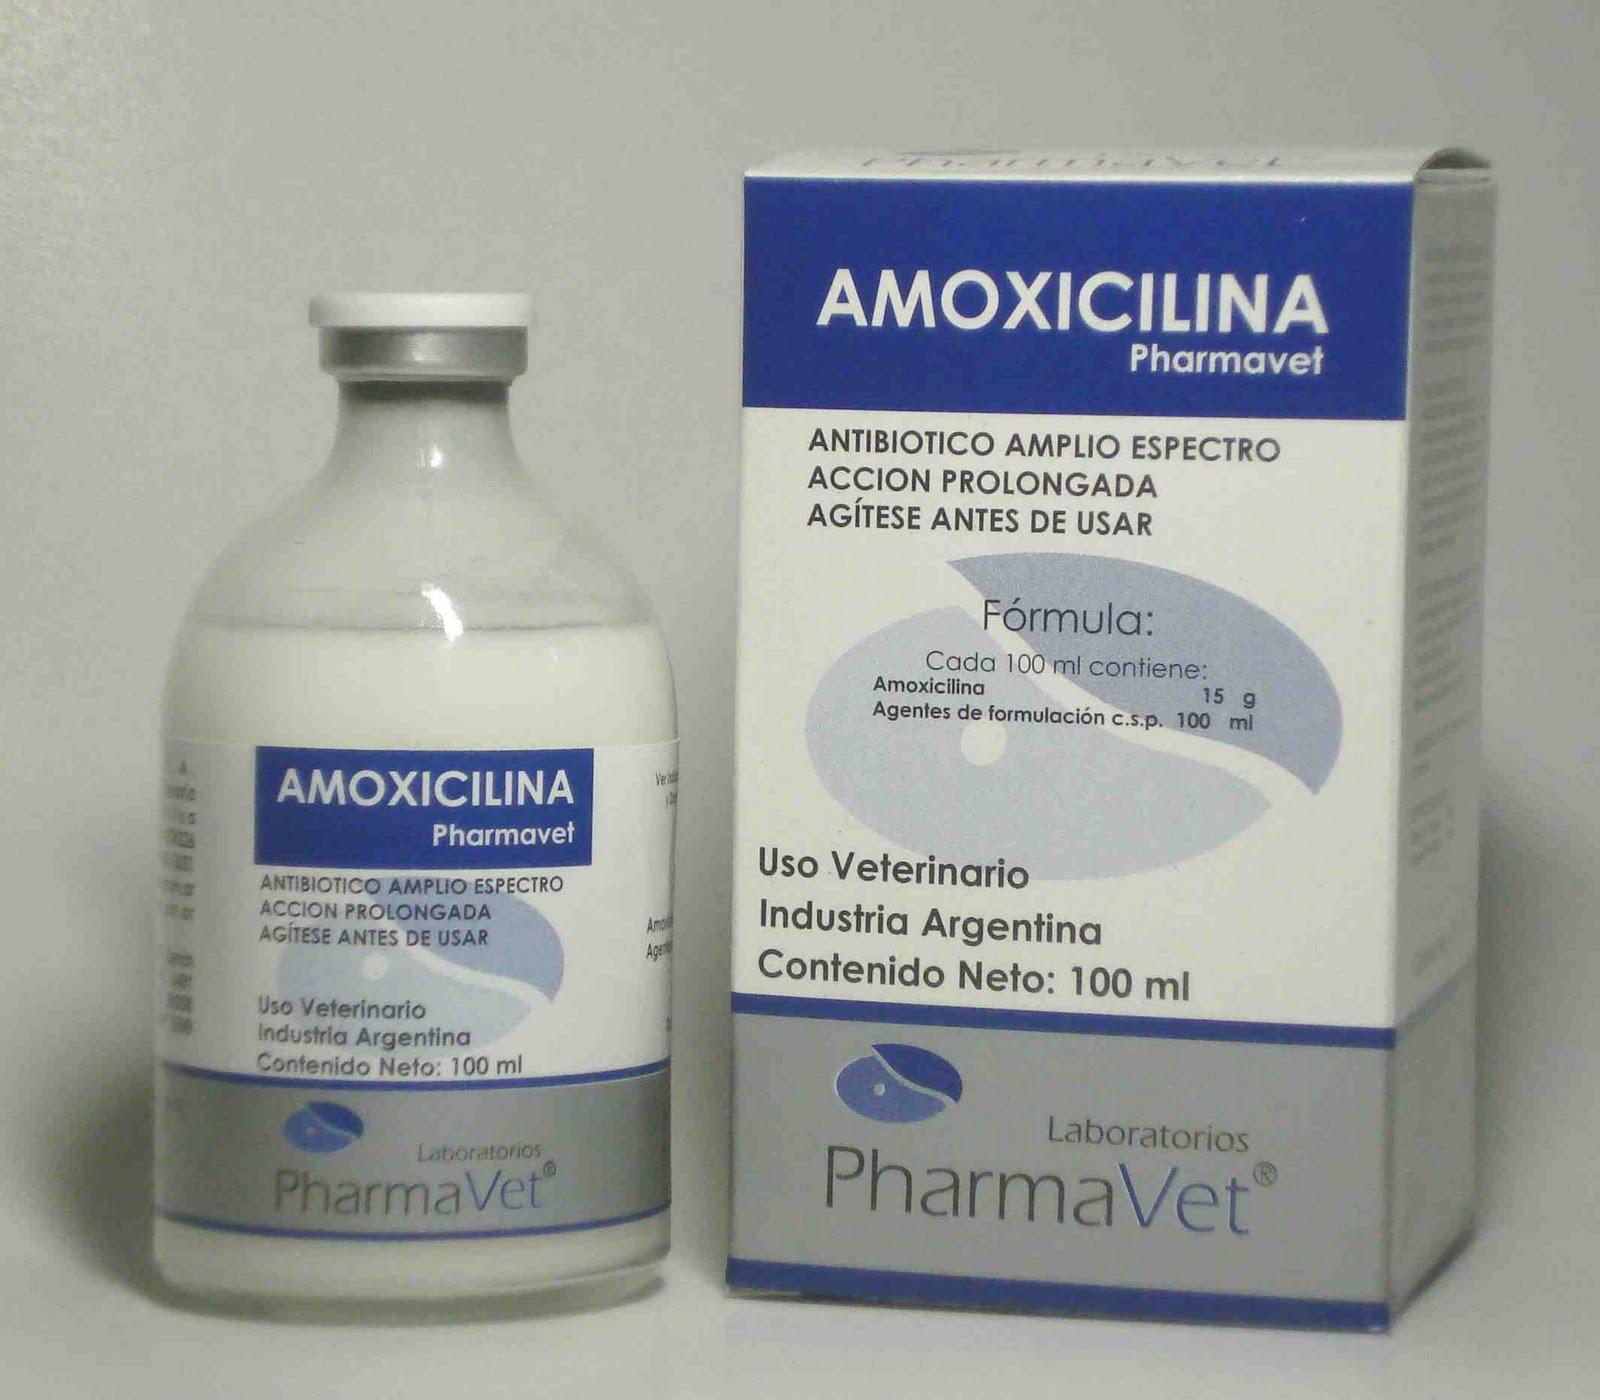 Amoxicilina (Oral)